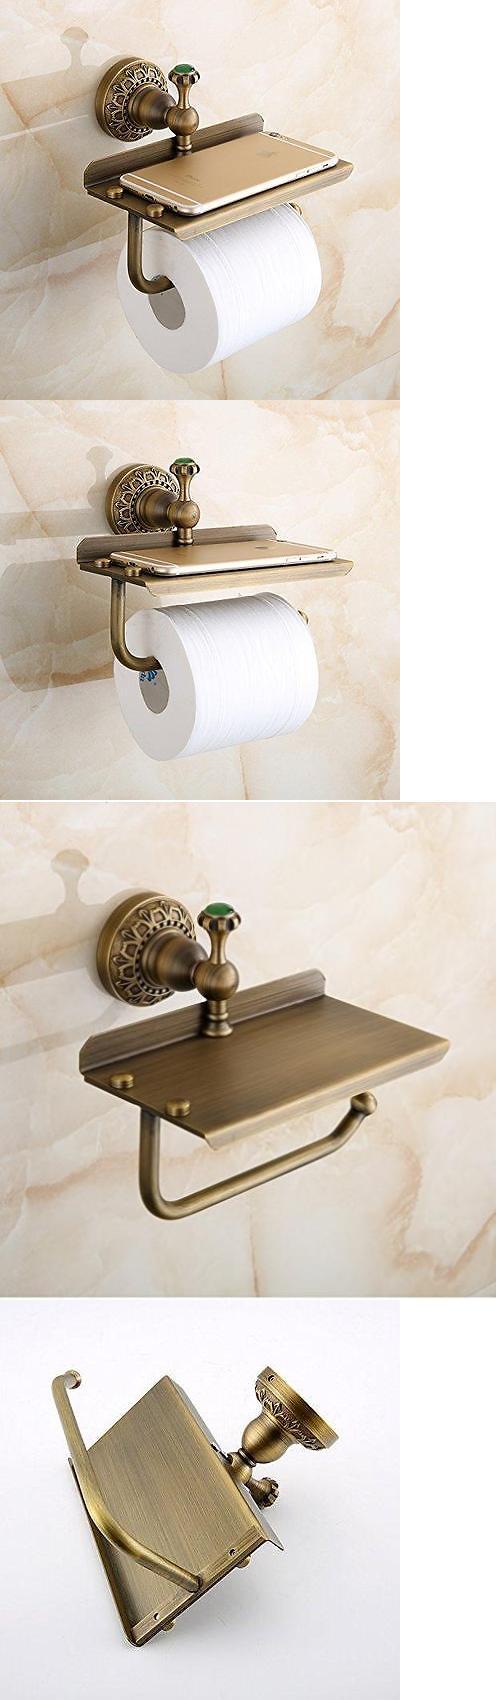 Toilet Paper Holdersmounted 32876 Beelee Bathroom Tissue Holder Classy Bathroom Tissue 2018